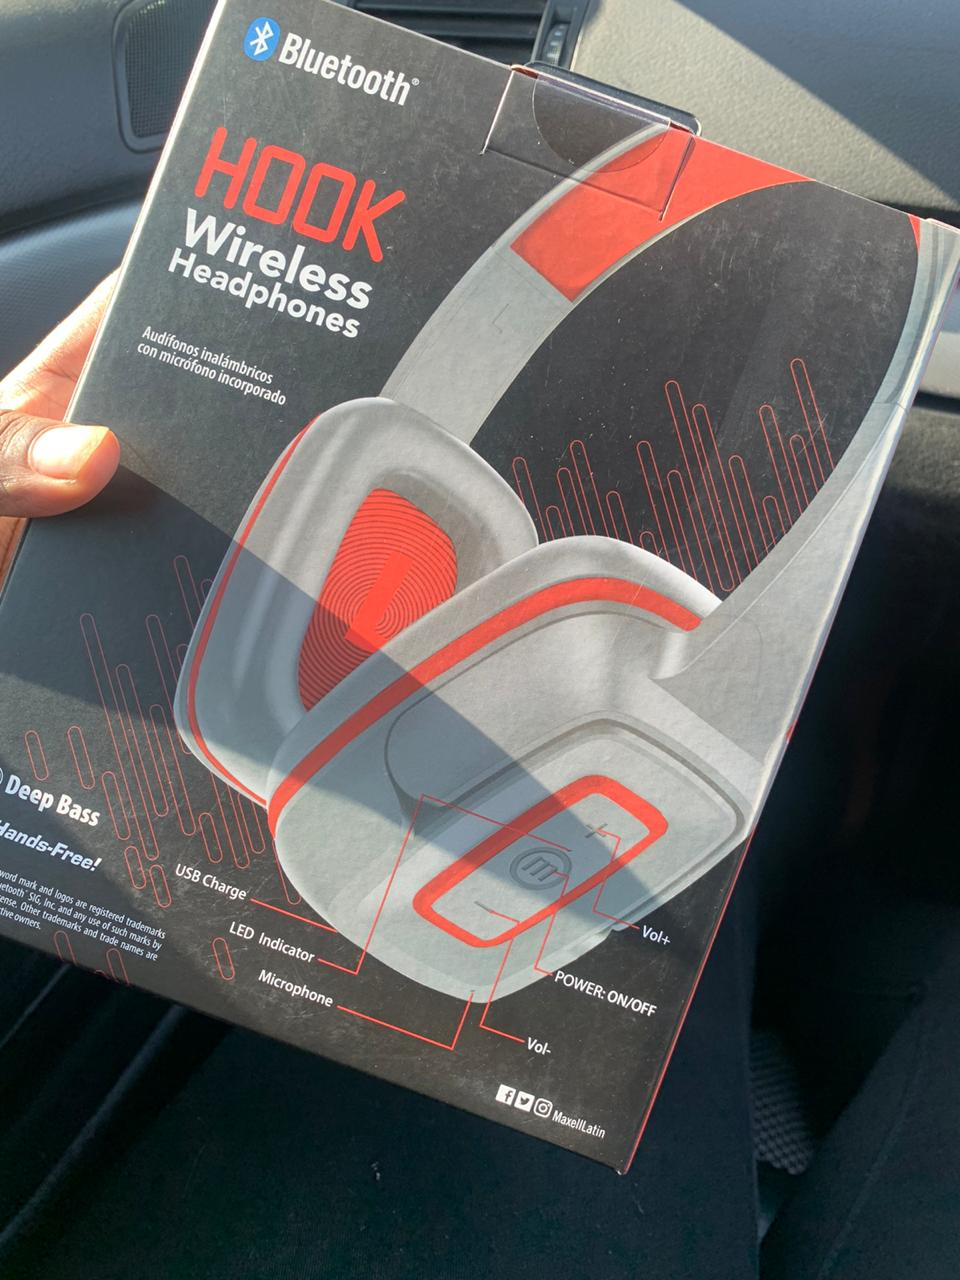 Maxell bluetooth headset